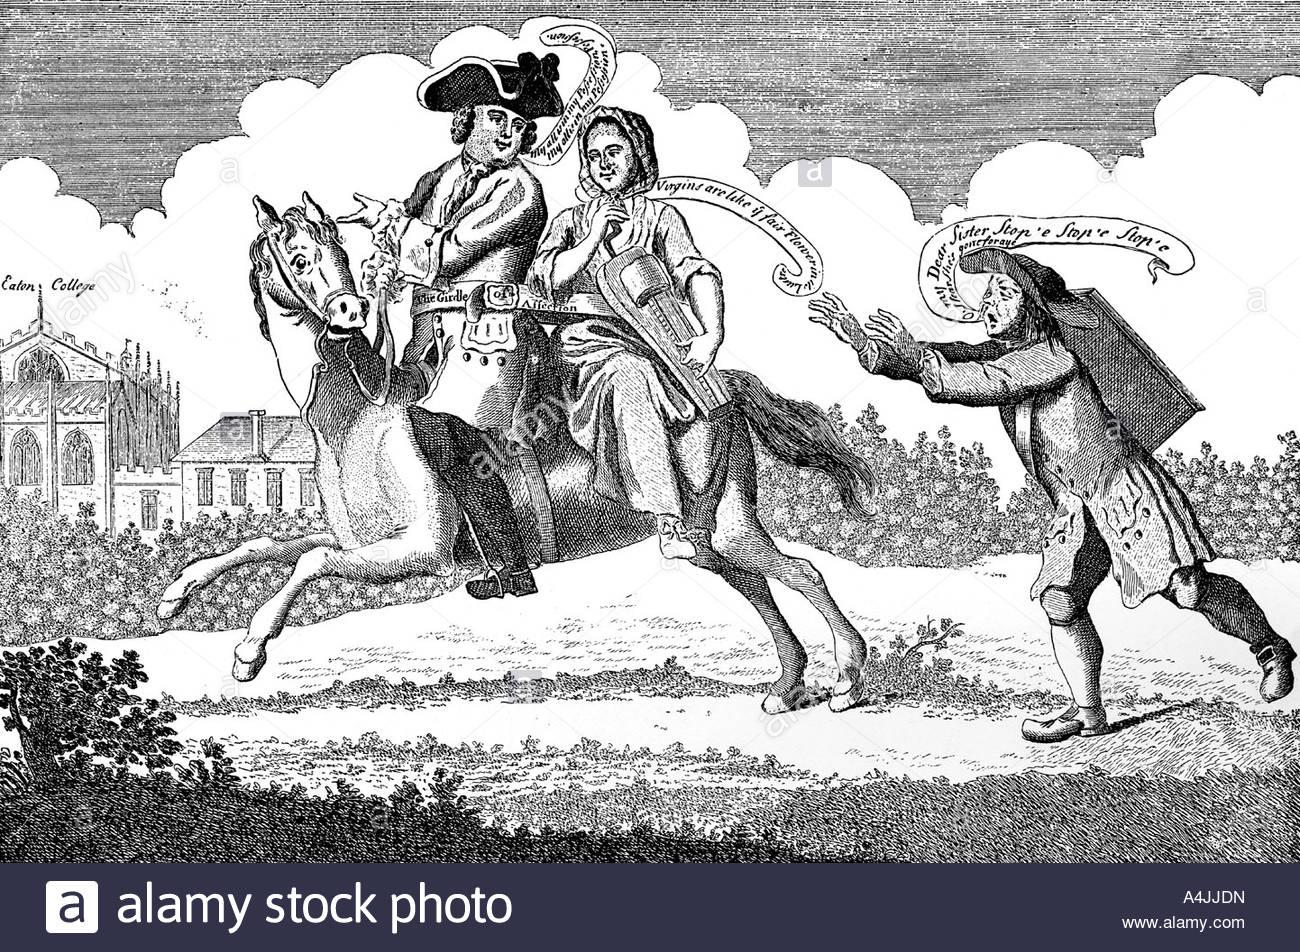 John of Gant mounted or Mars on his Journey 1747  - Stock Image